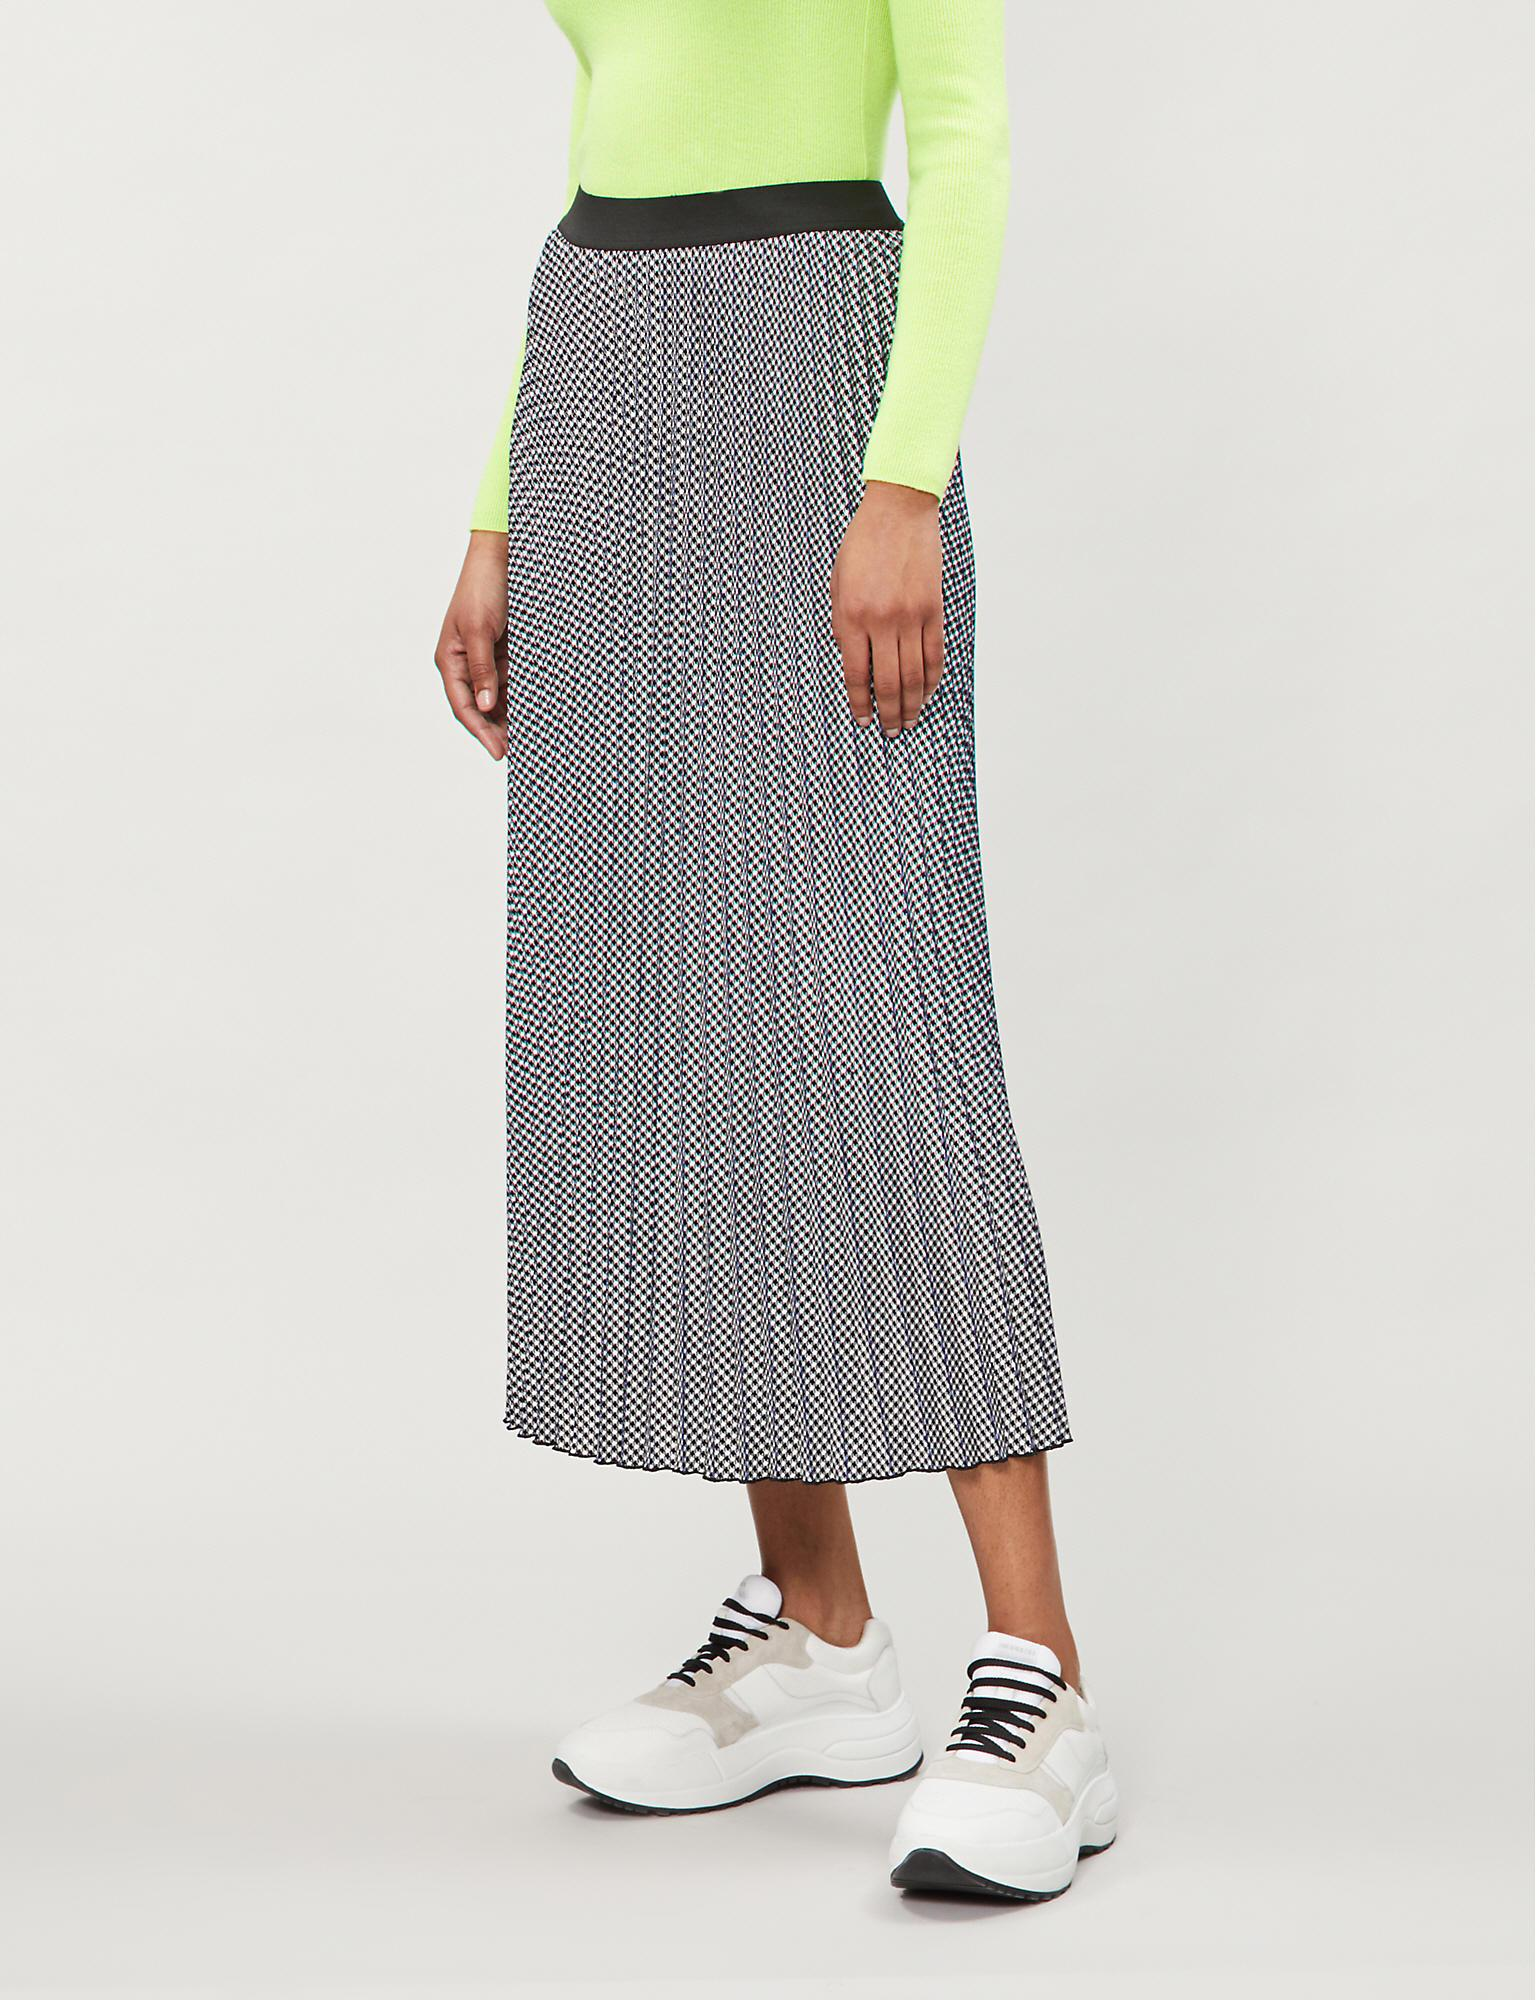 84551bf81 Maje - Gray Jazia Houndstooth Pleated Skirt - Lyst. View fullscreen